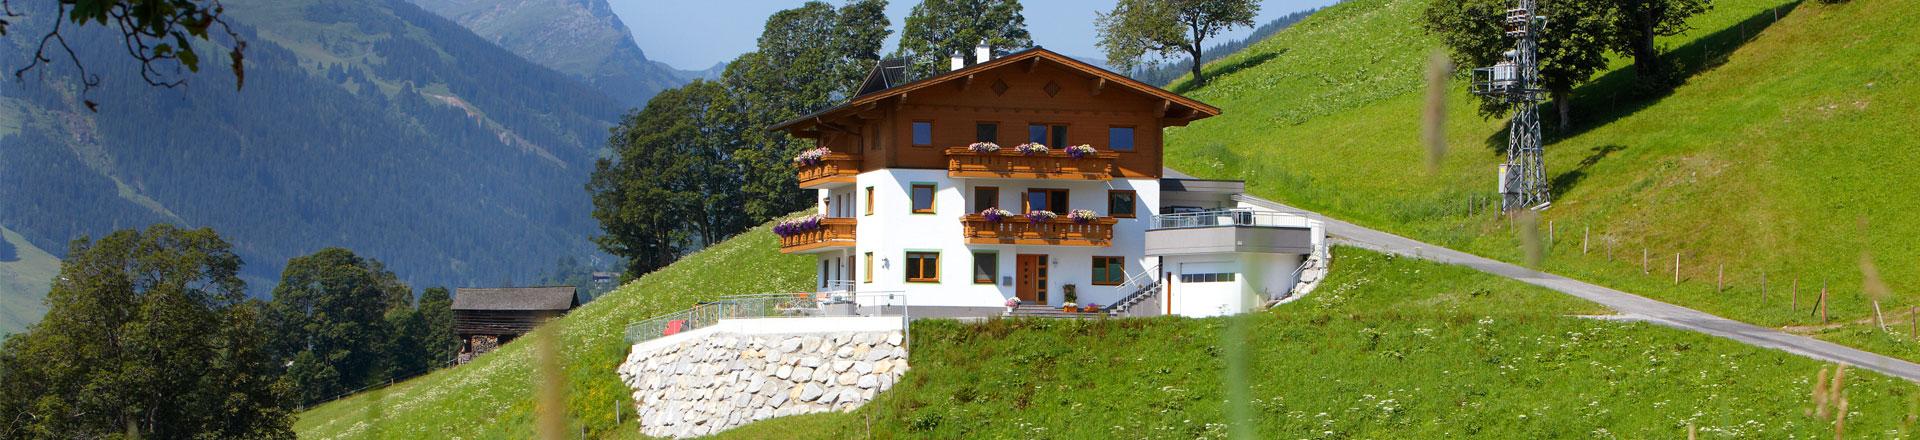 Saalbach Blick Appartements & Berggasthaus Bärnalm in Saalbach